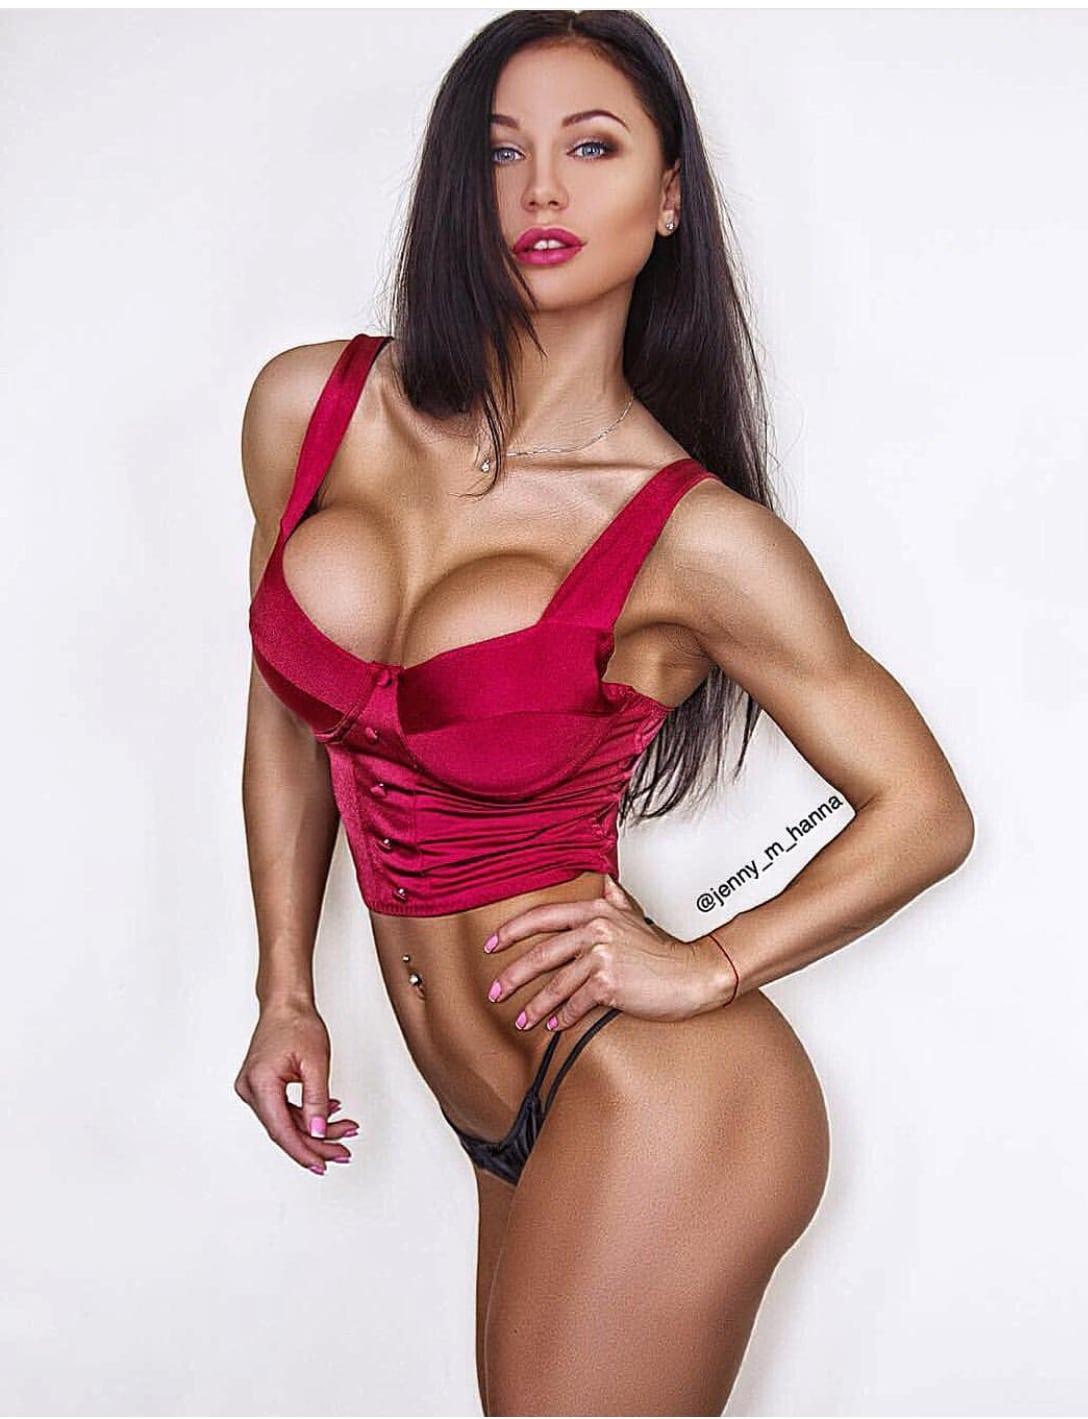 Jenny-bikini1